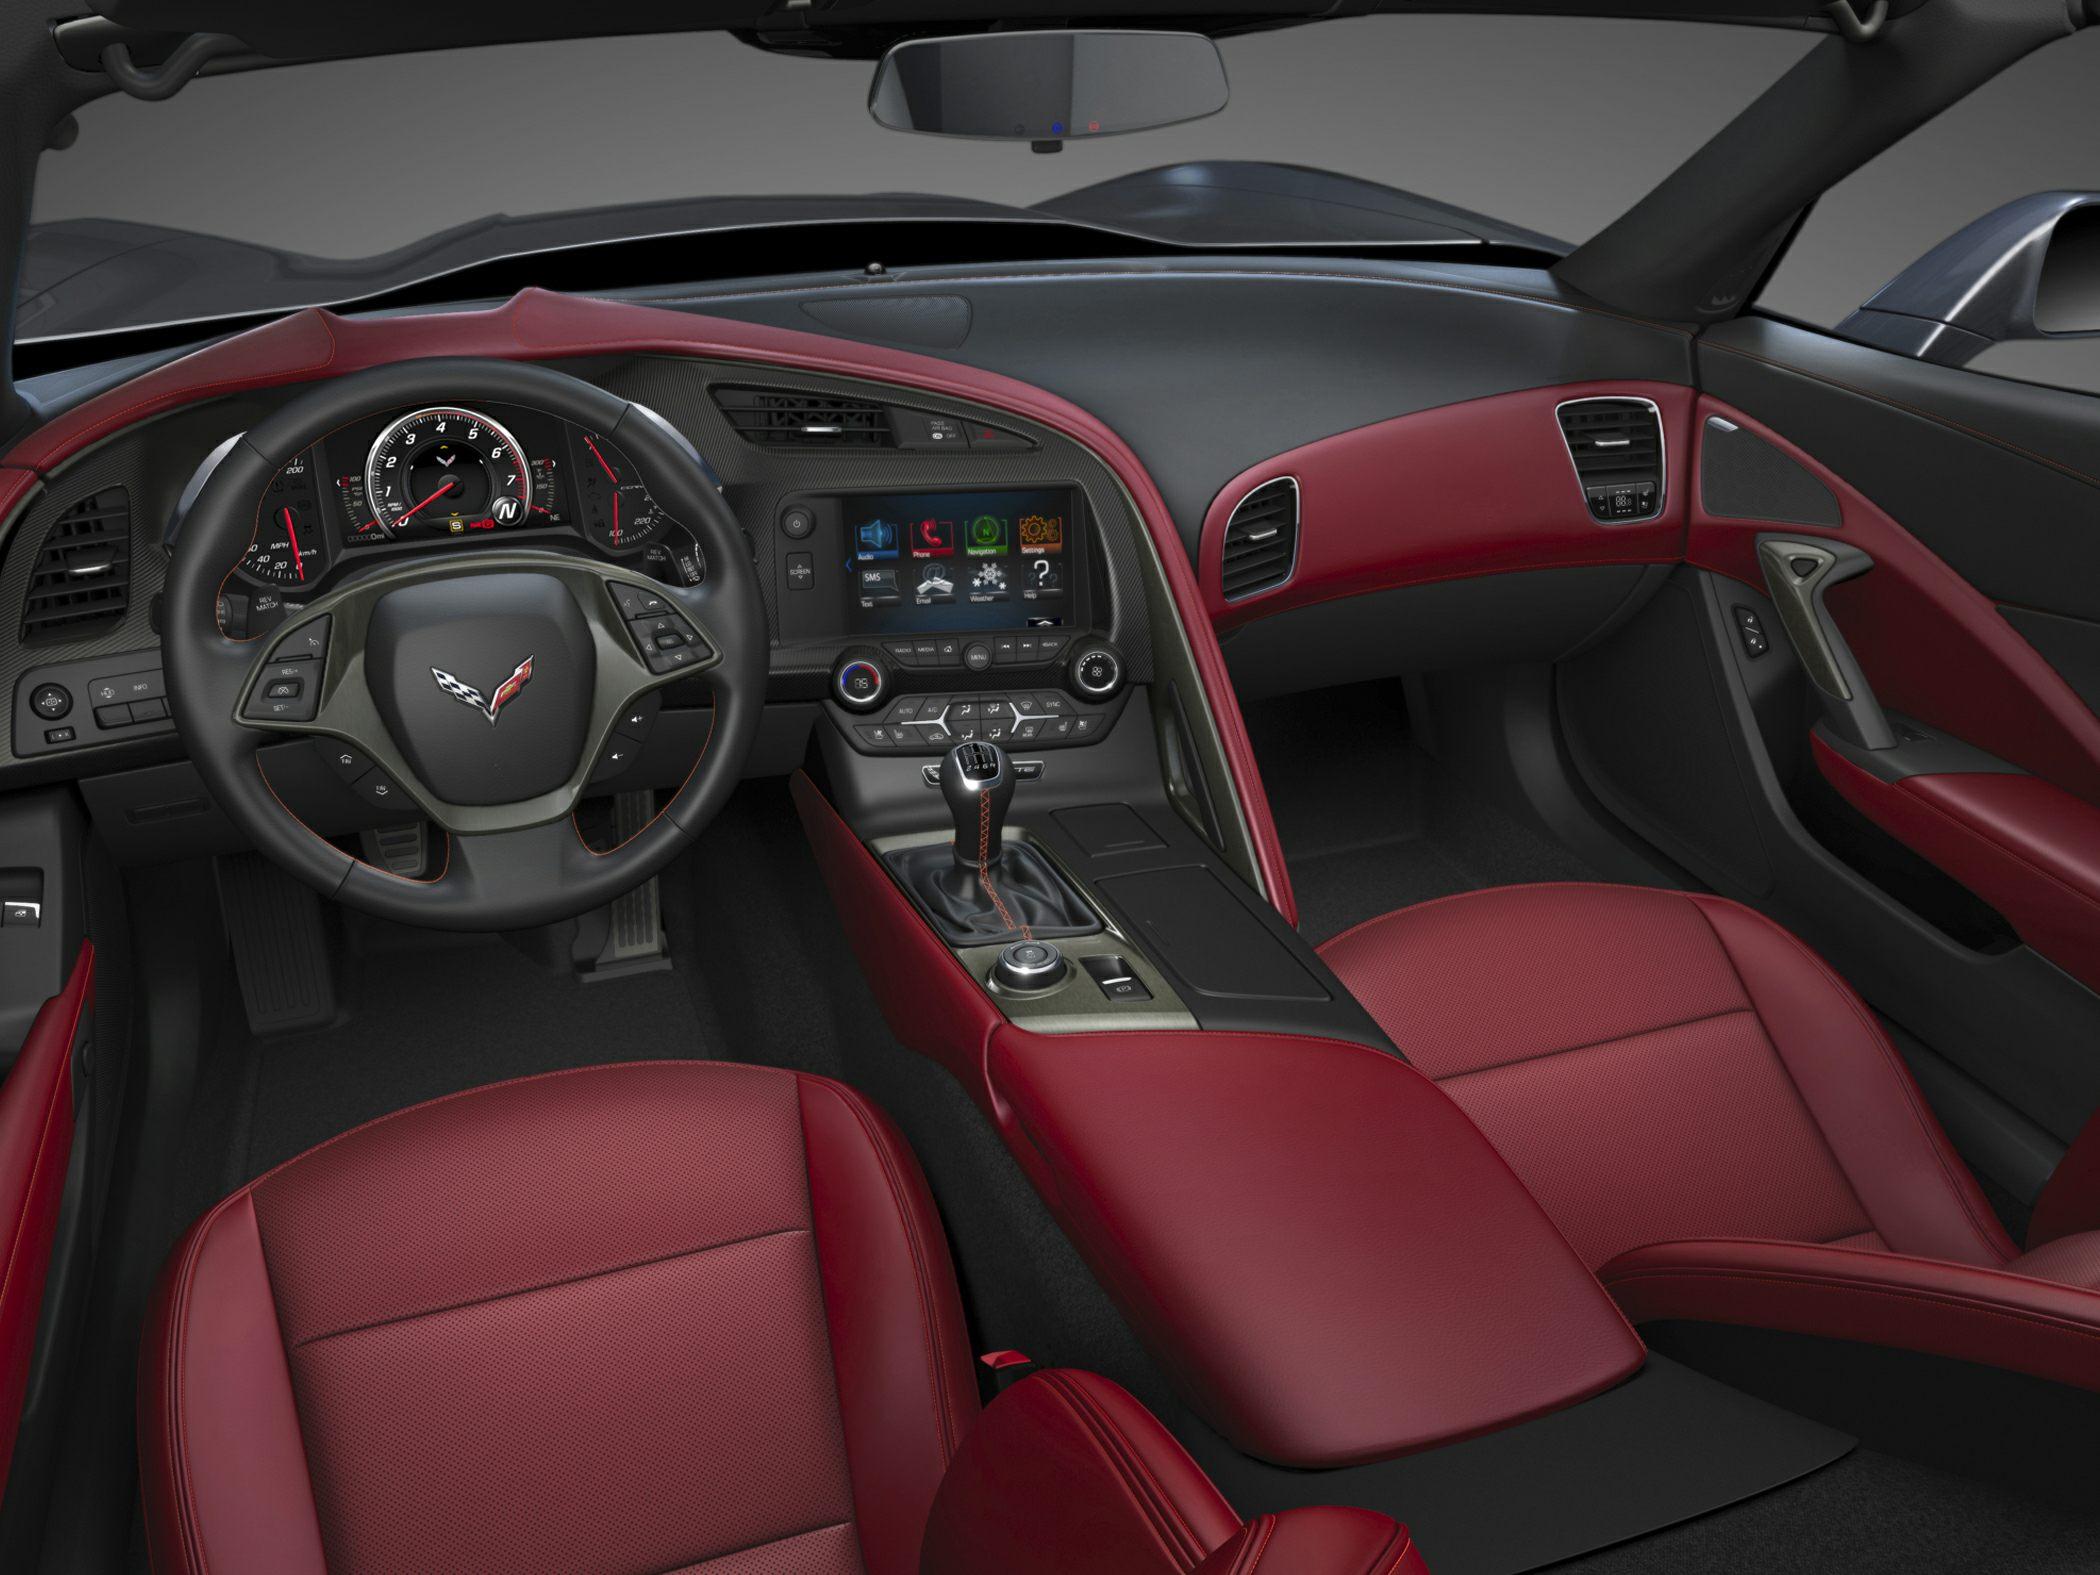 2014 chevrolet corvette stingray review youtube -  Color